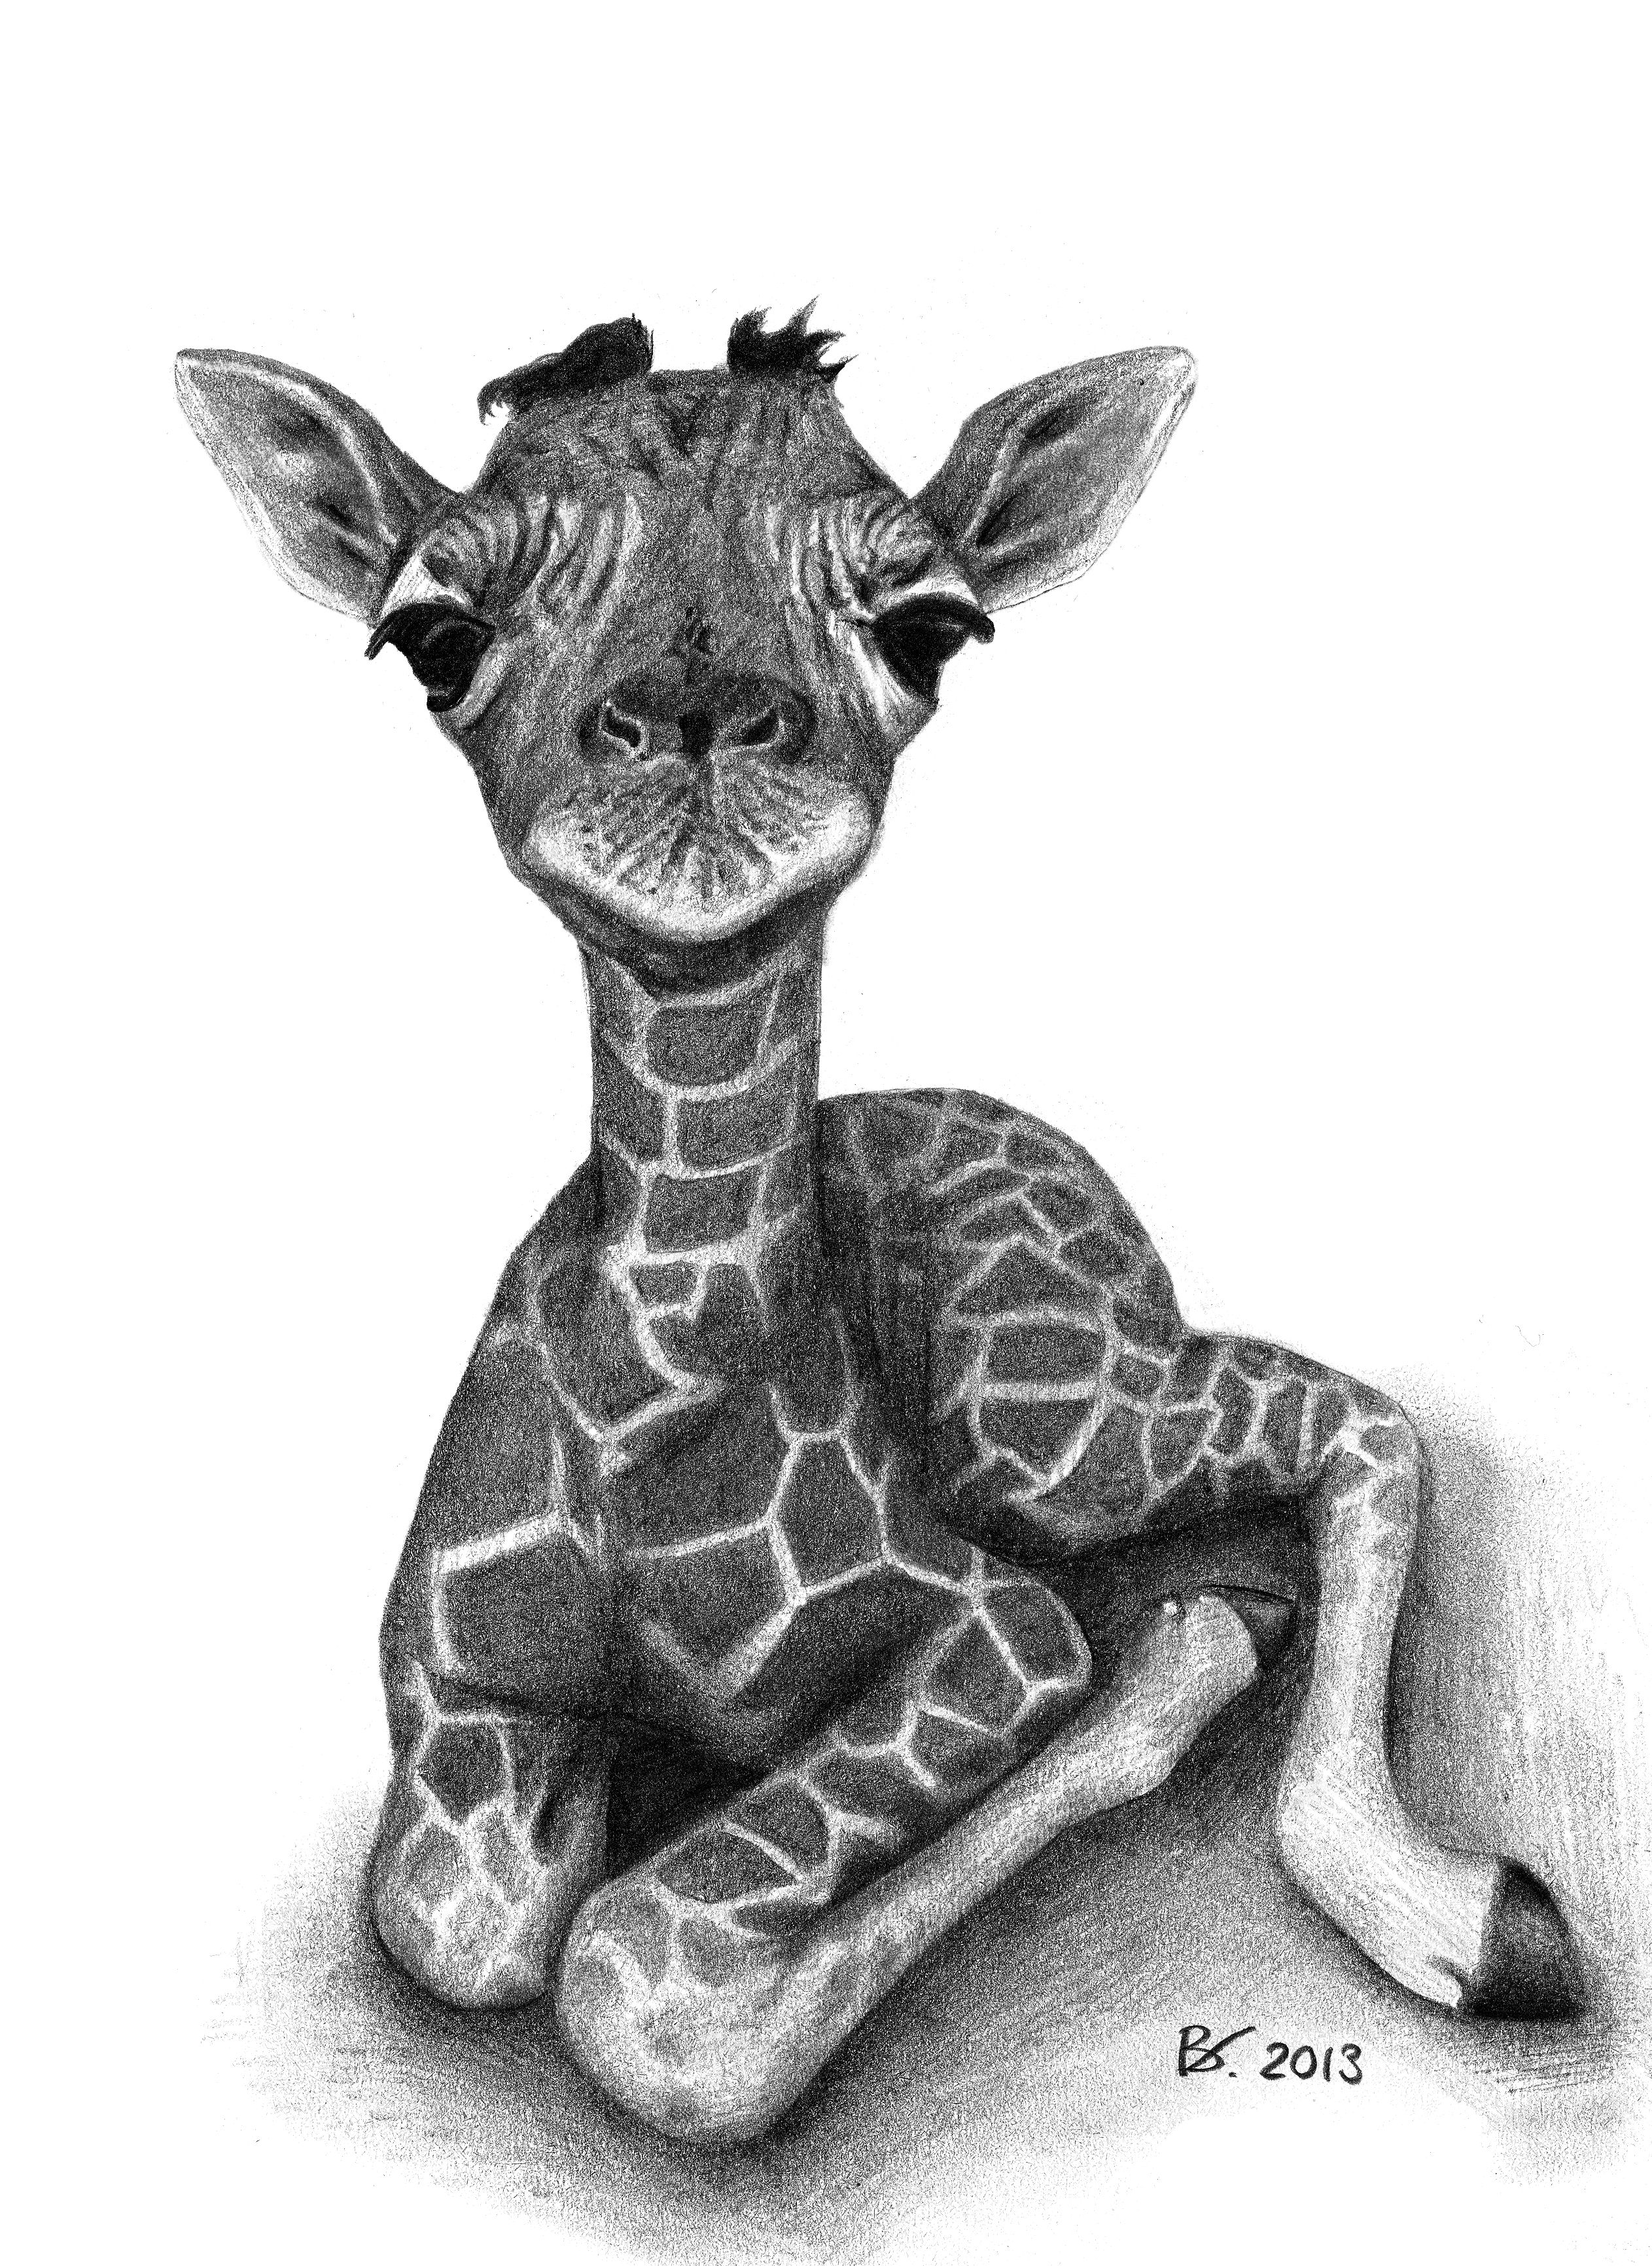 Drawing Of A Cute Baby Giraffe Realism Animal Fine Arts